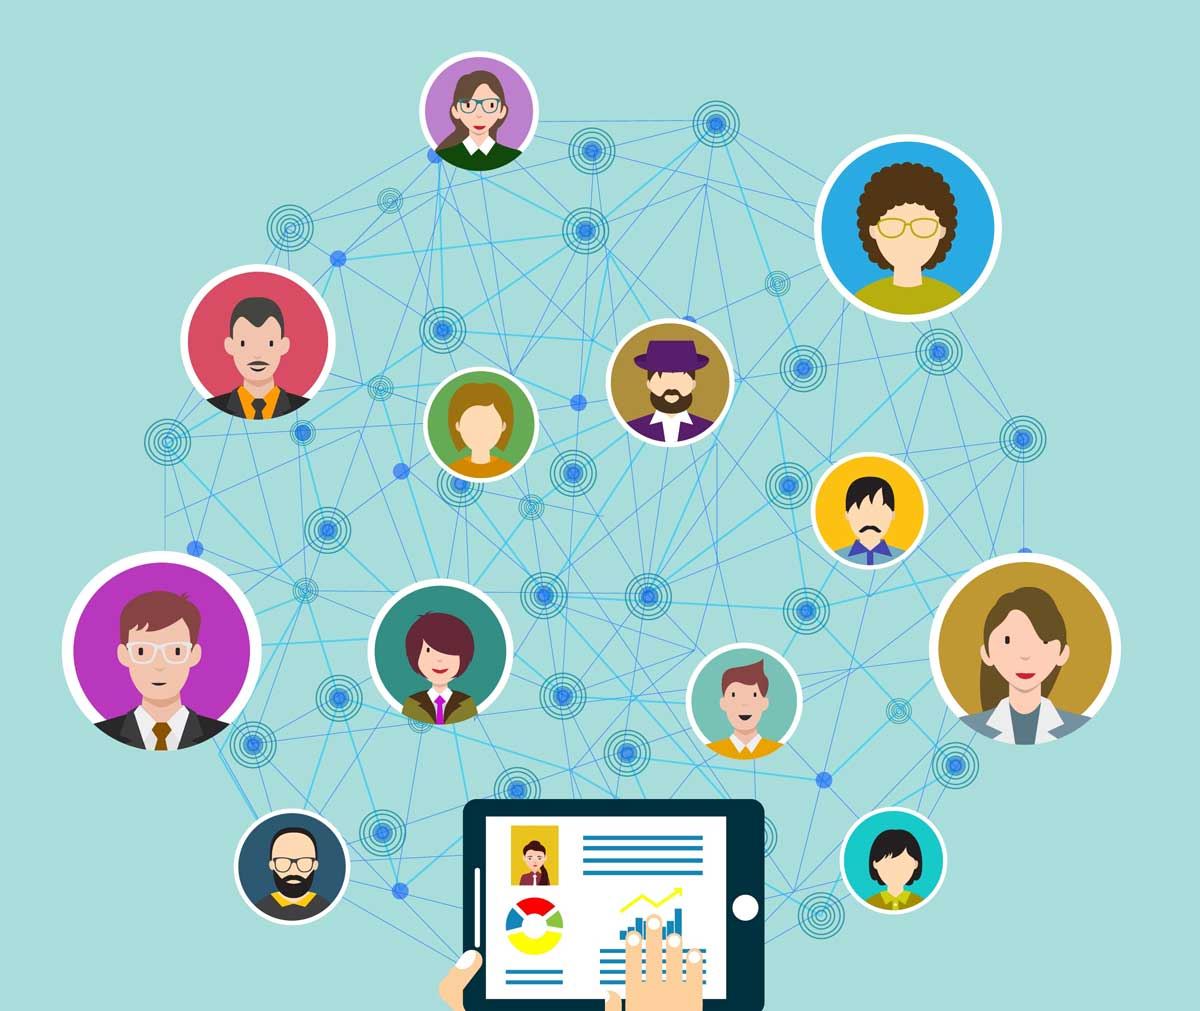 Advantages of Social Media on Society